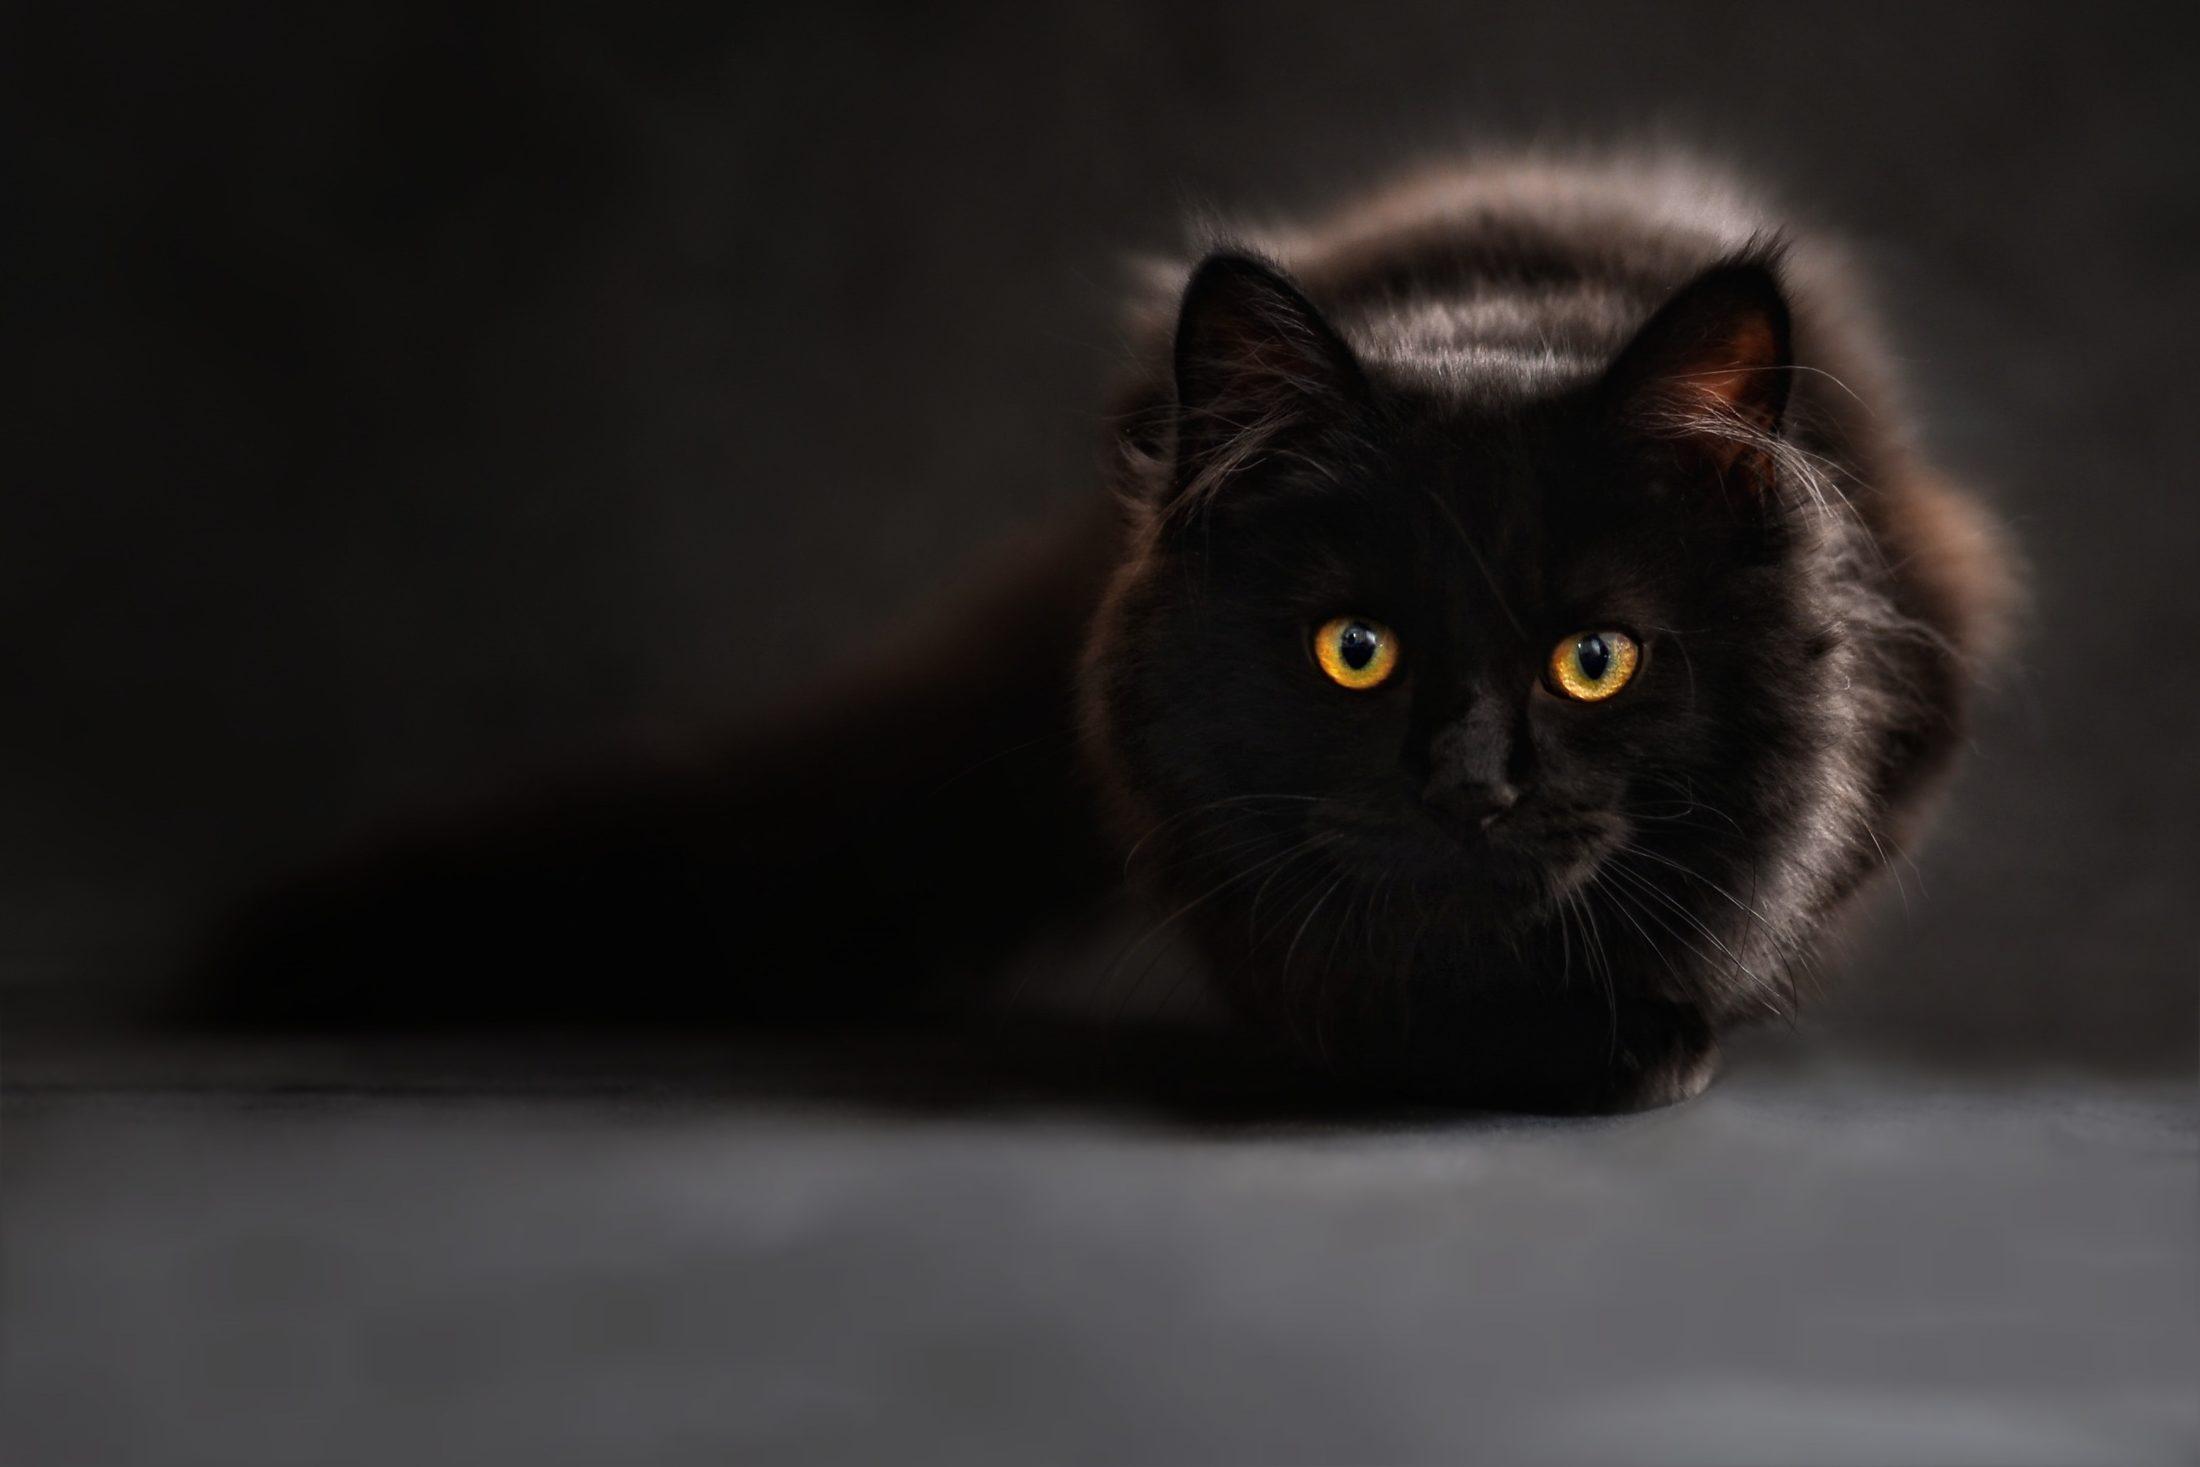 O instinto cacador de gato está presente nos gatos domésticos.